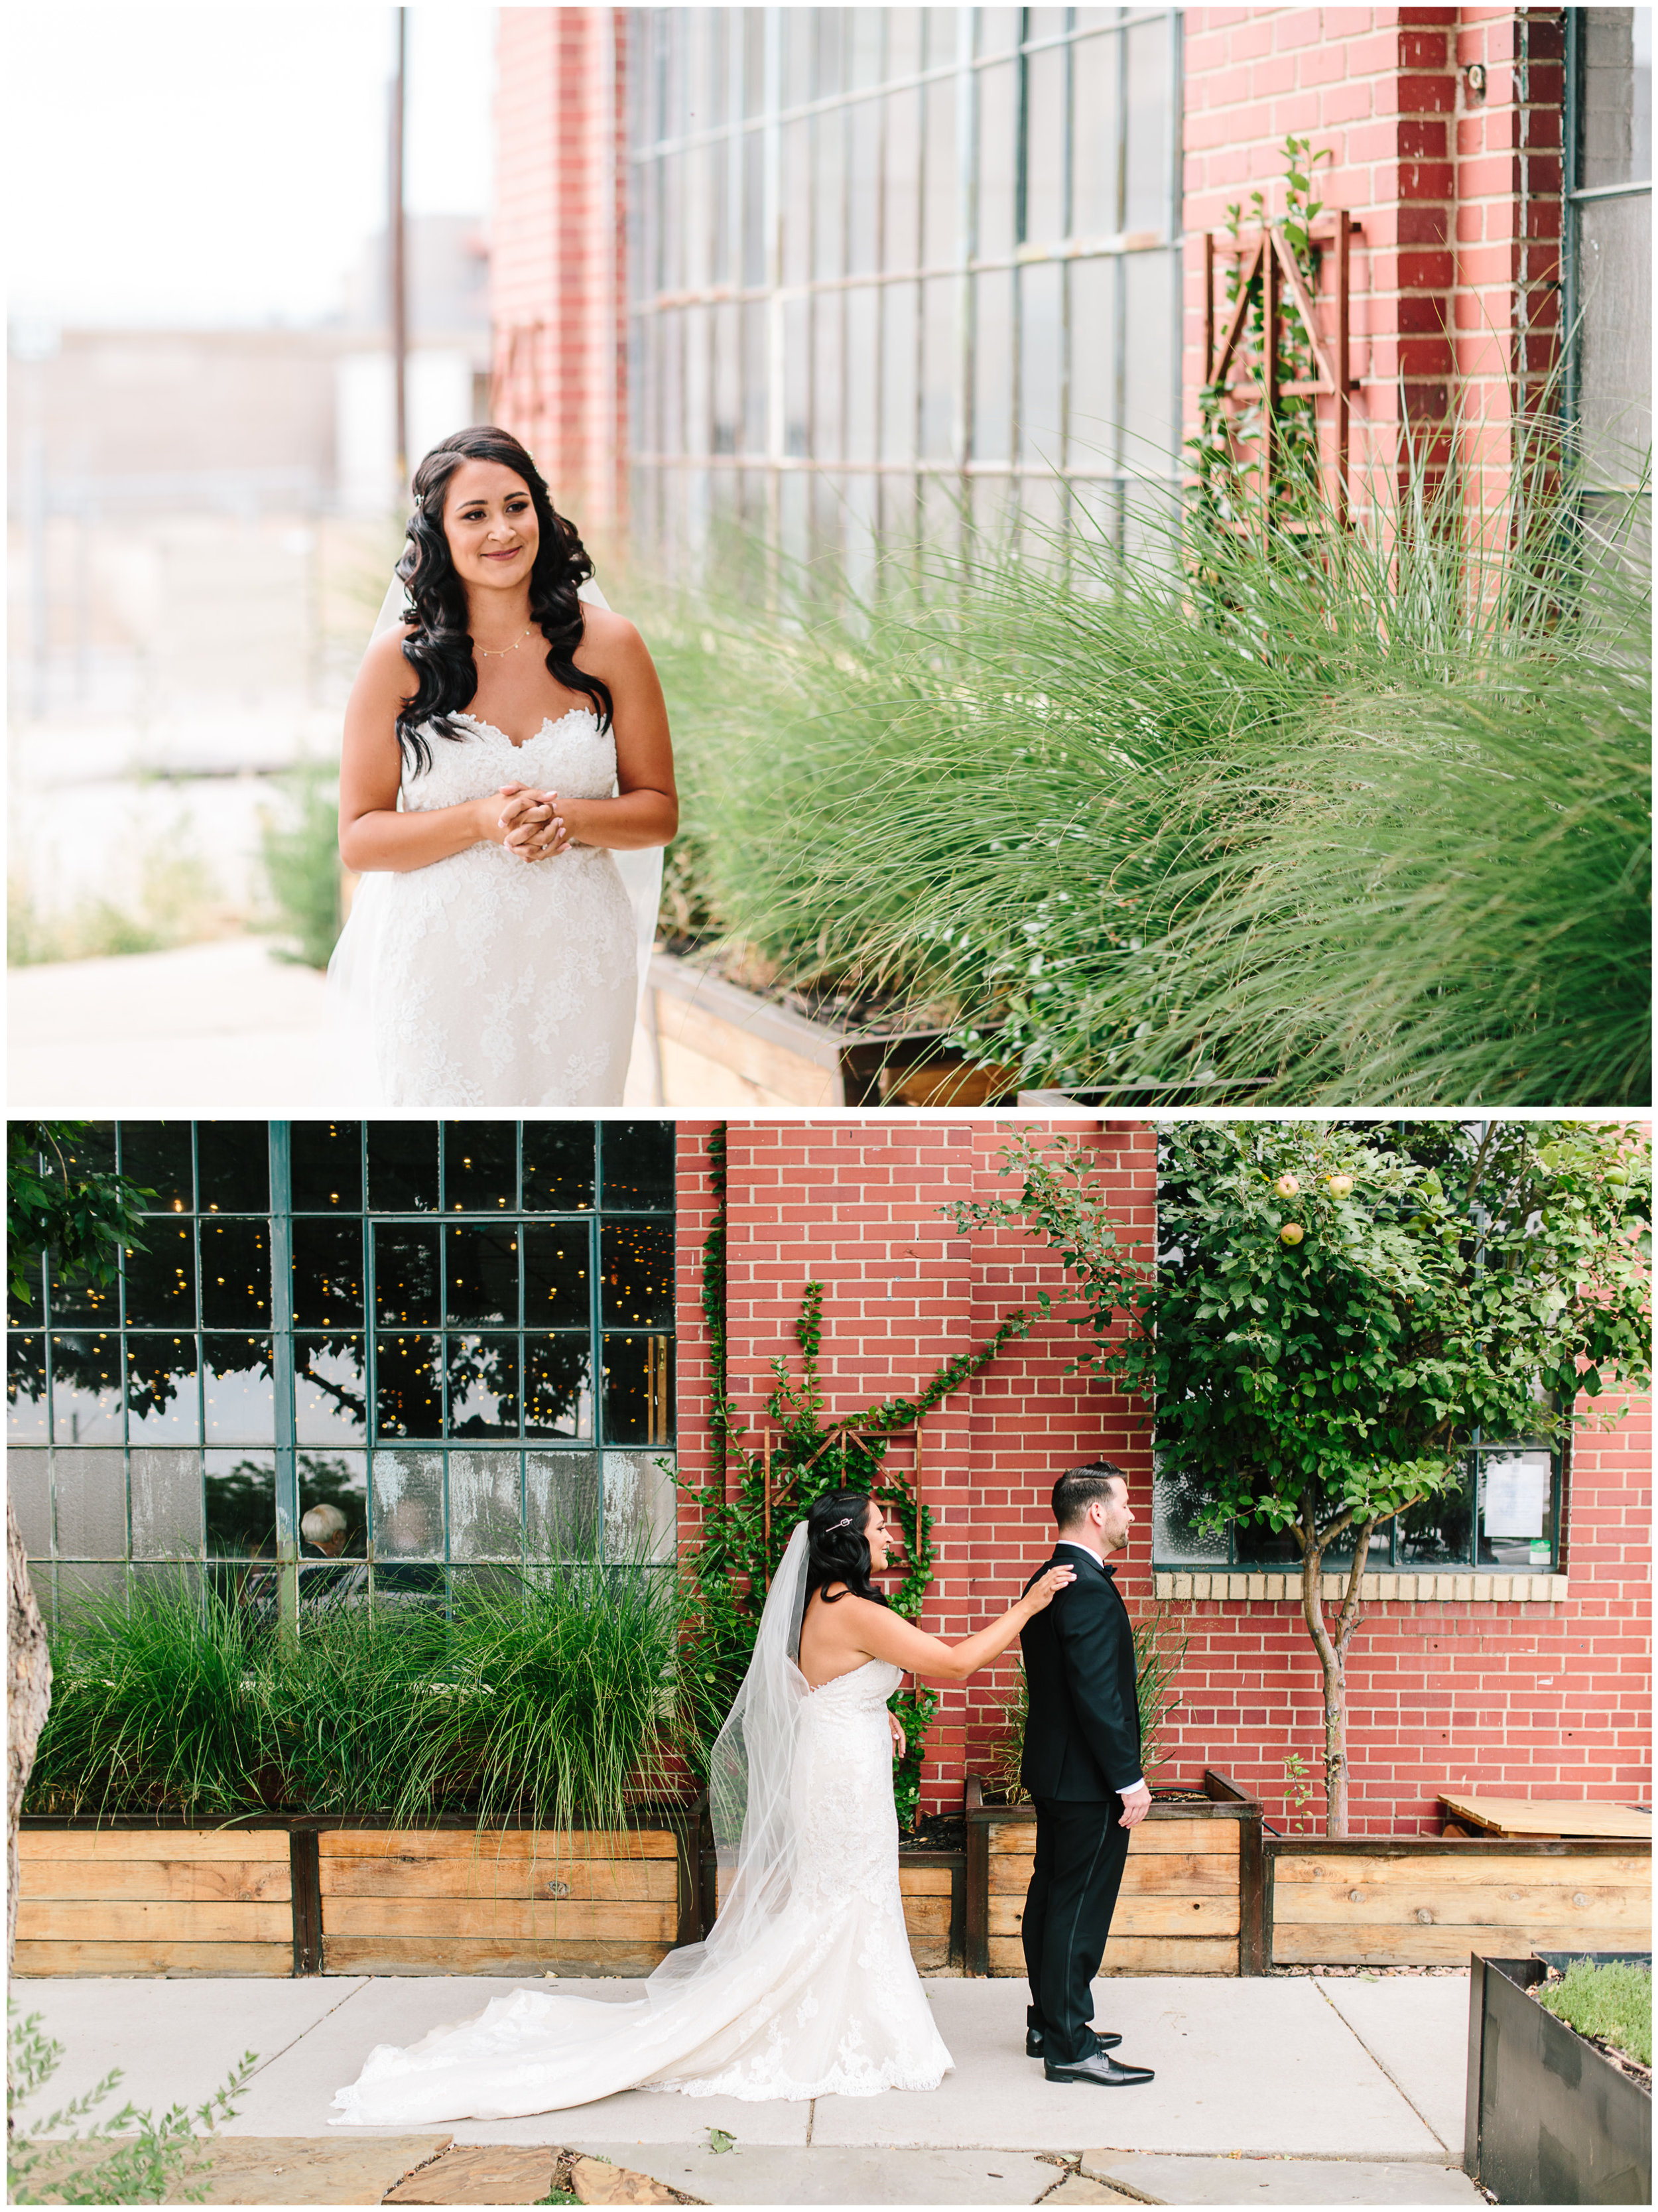 moss_denver_wedding_17.jpg